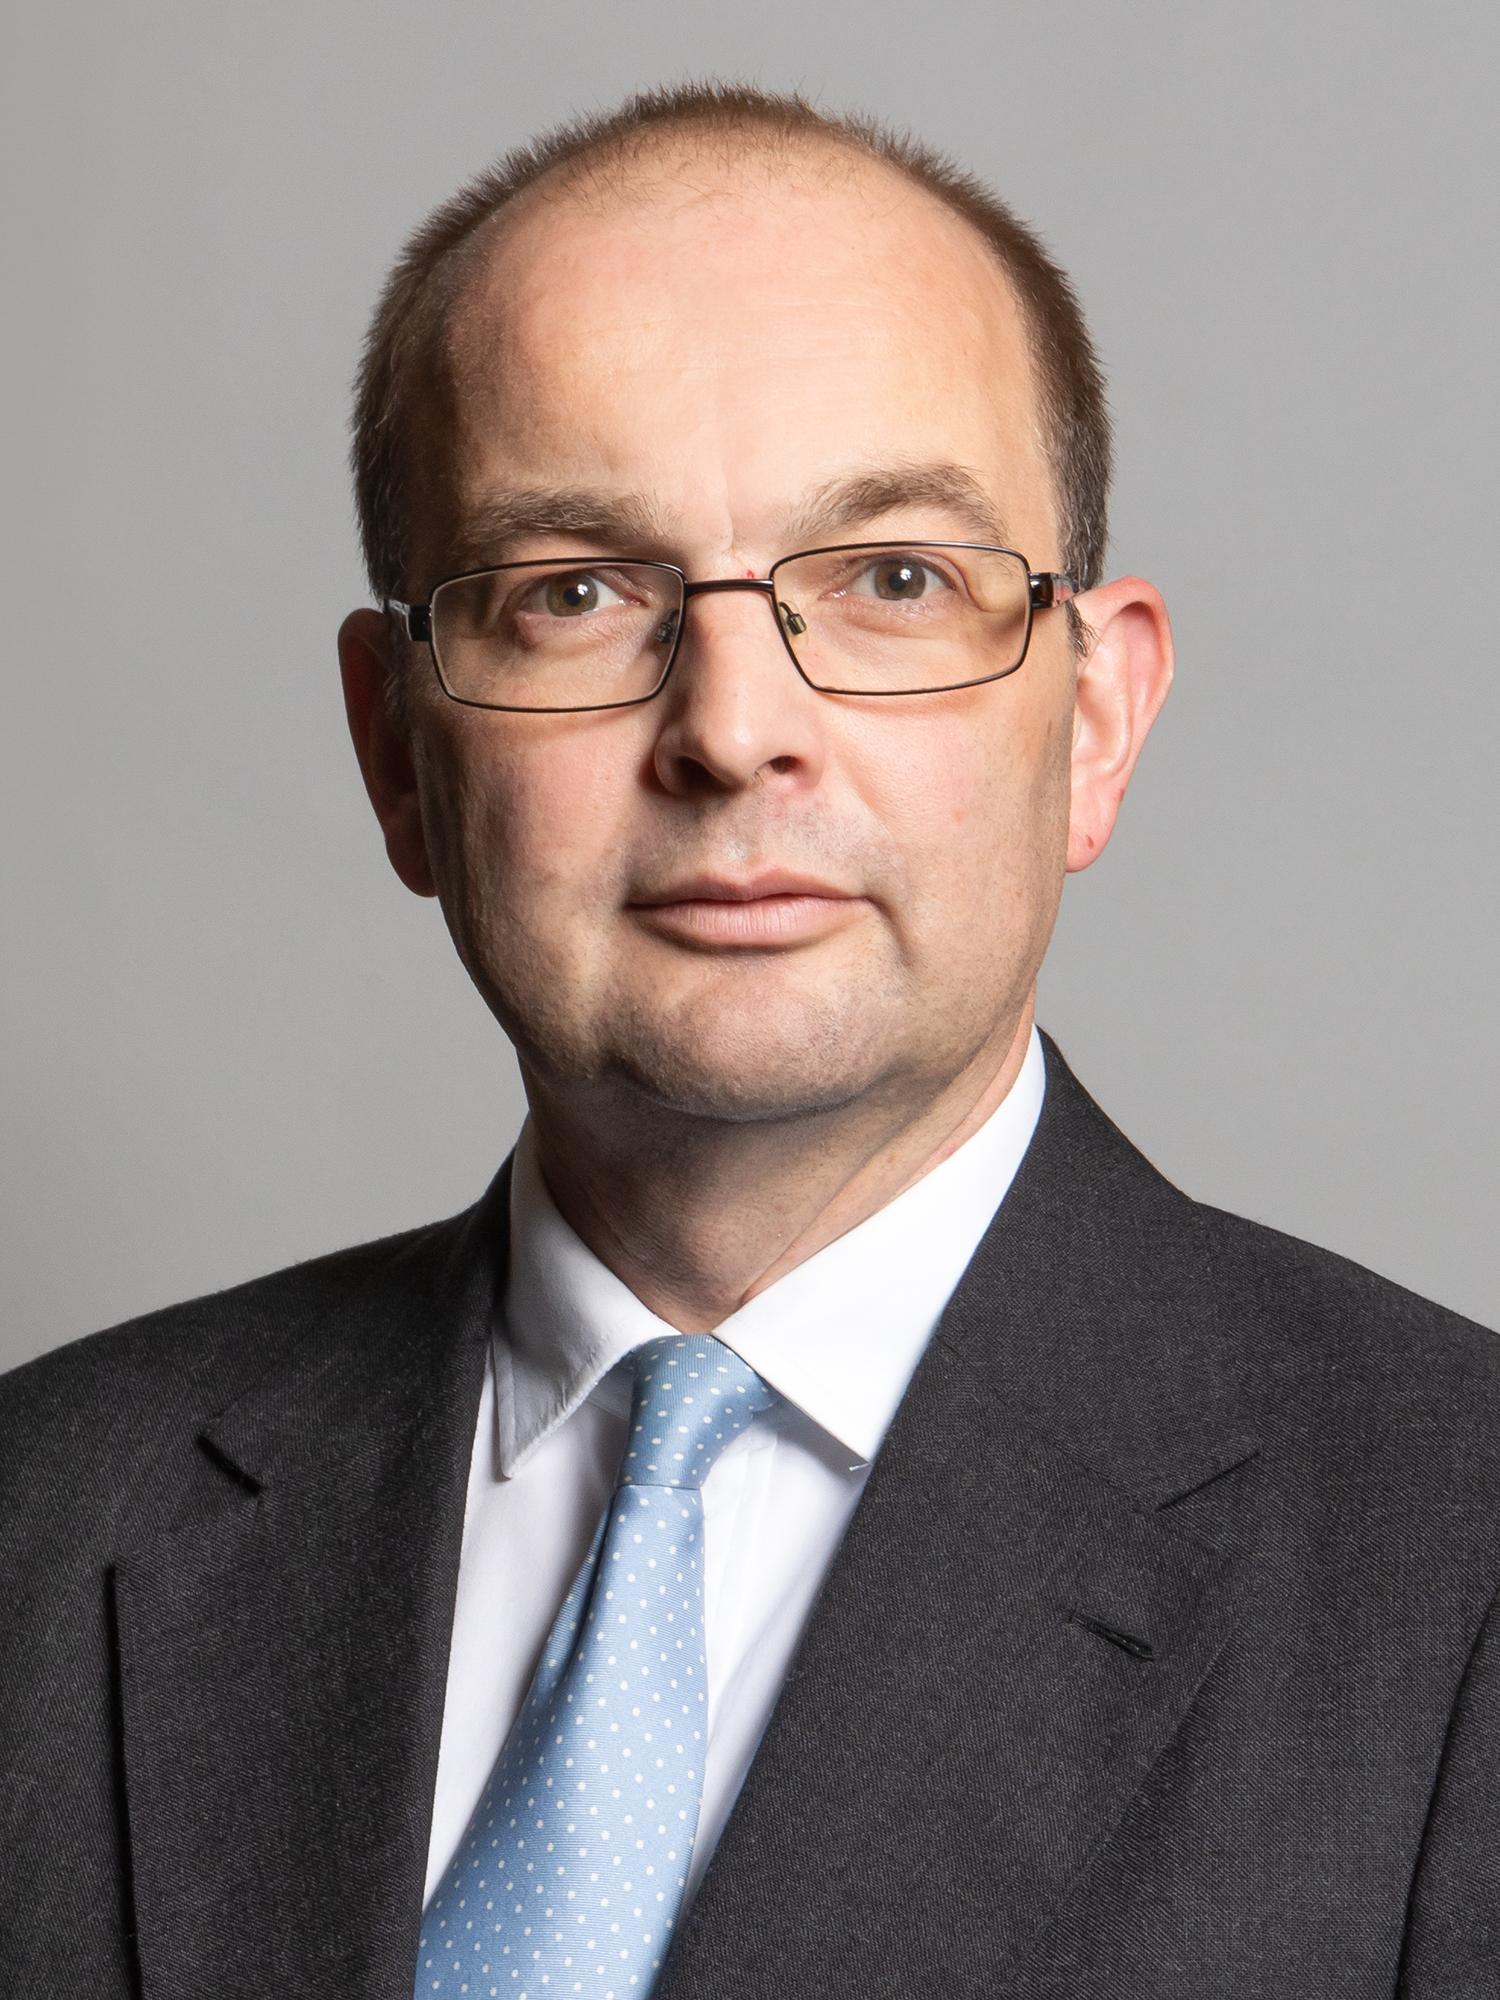 James Duddridge - Wikipedia